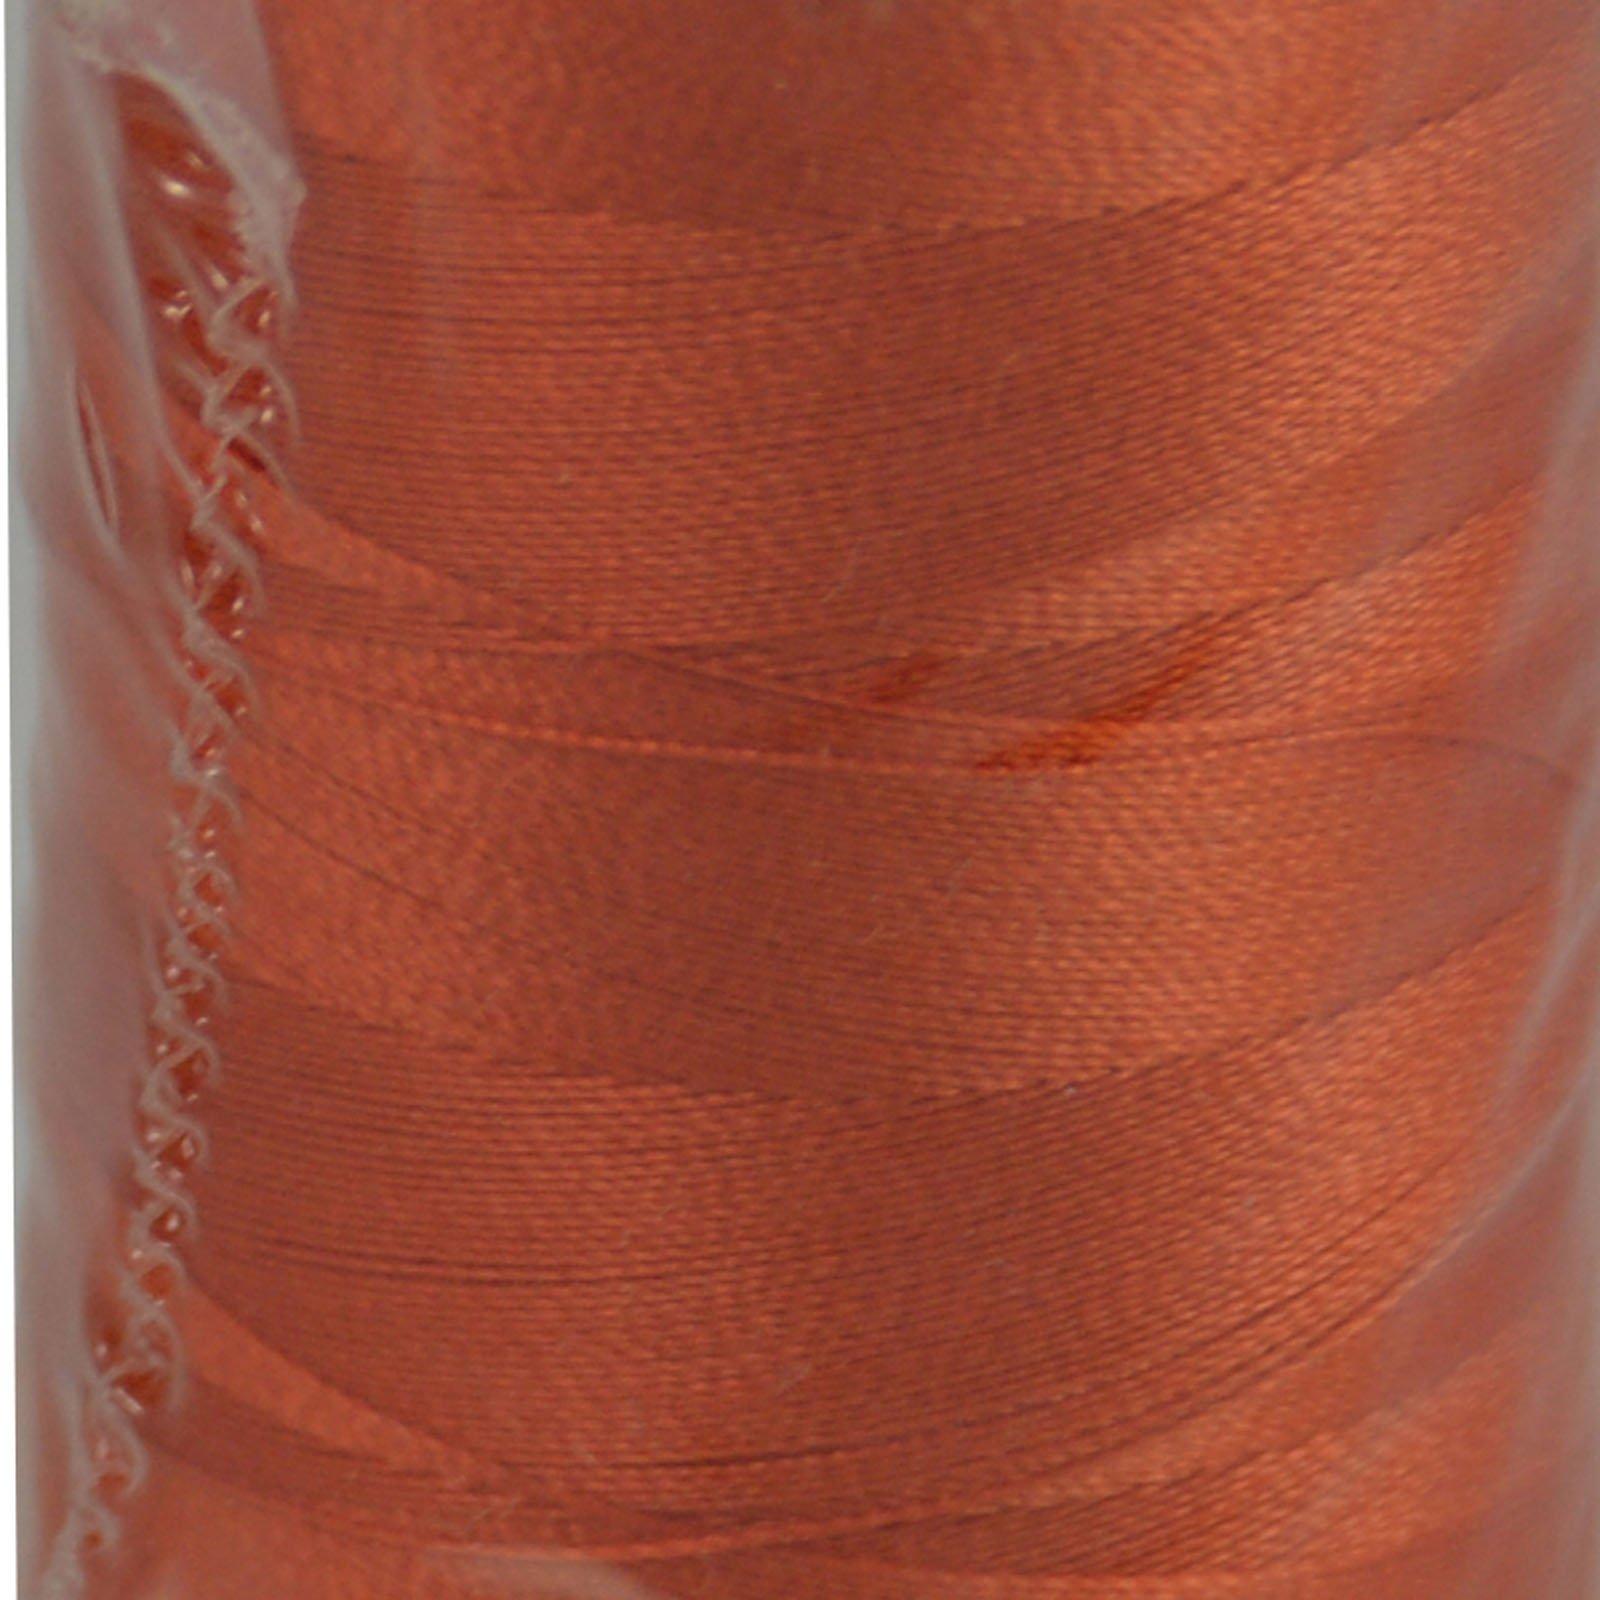 # 2245 Red Orange